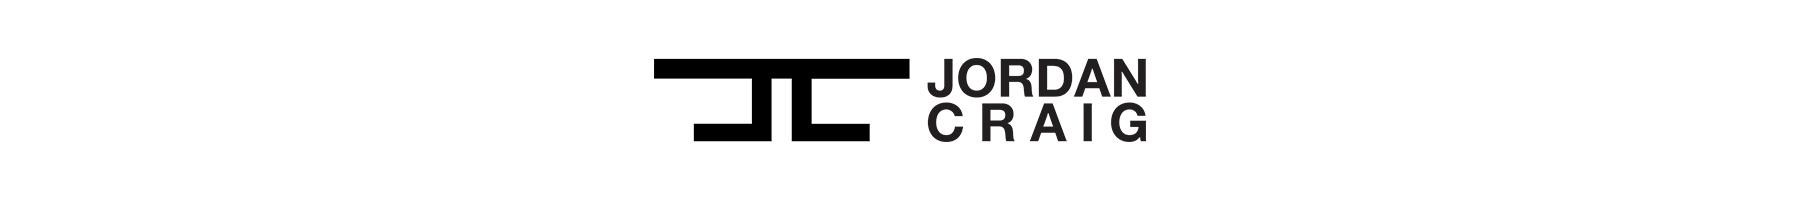 DrJays.com - Jordan Craig